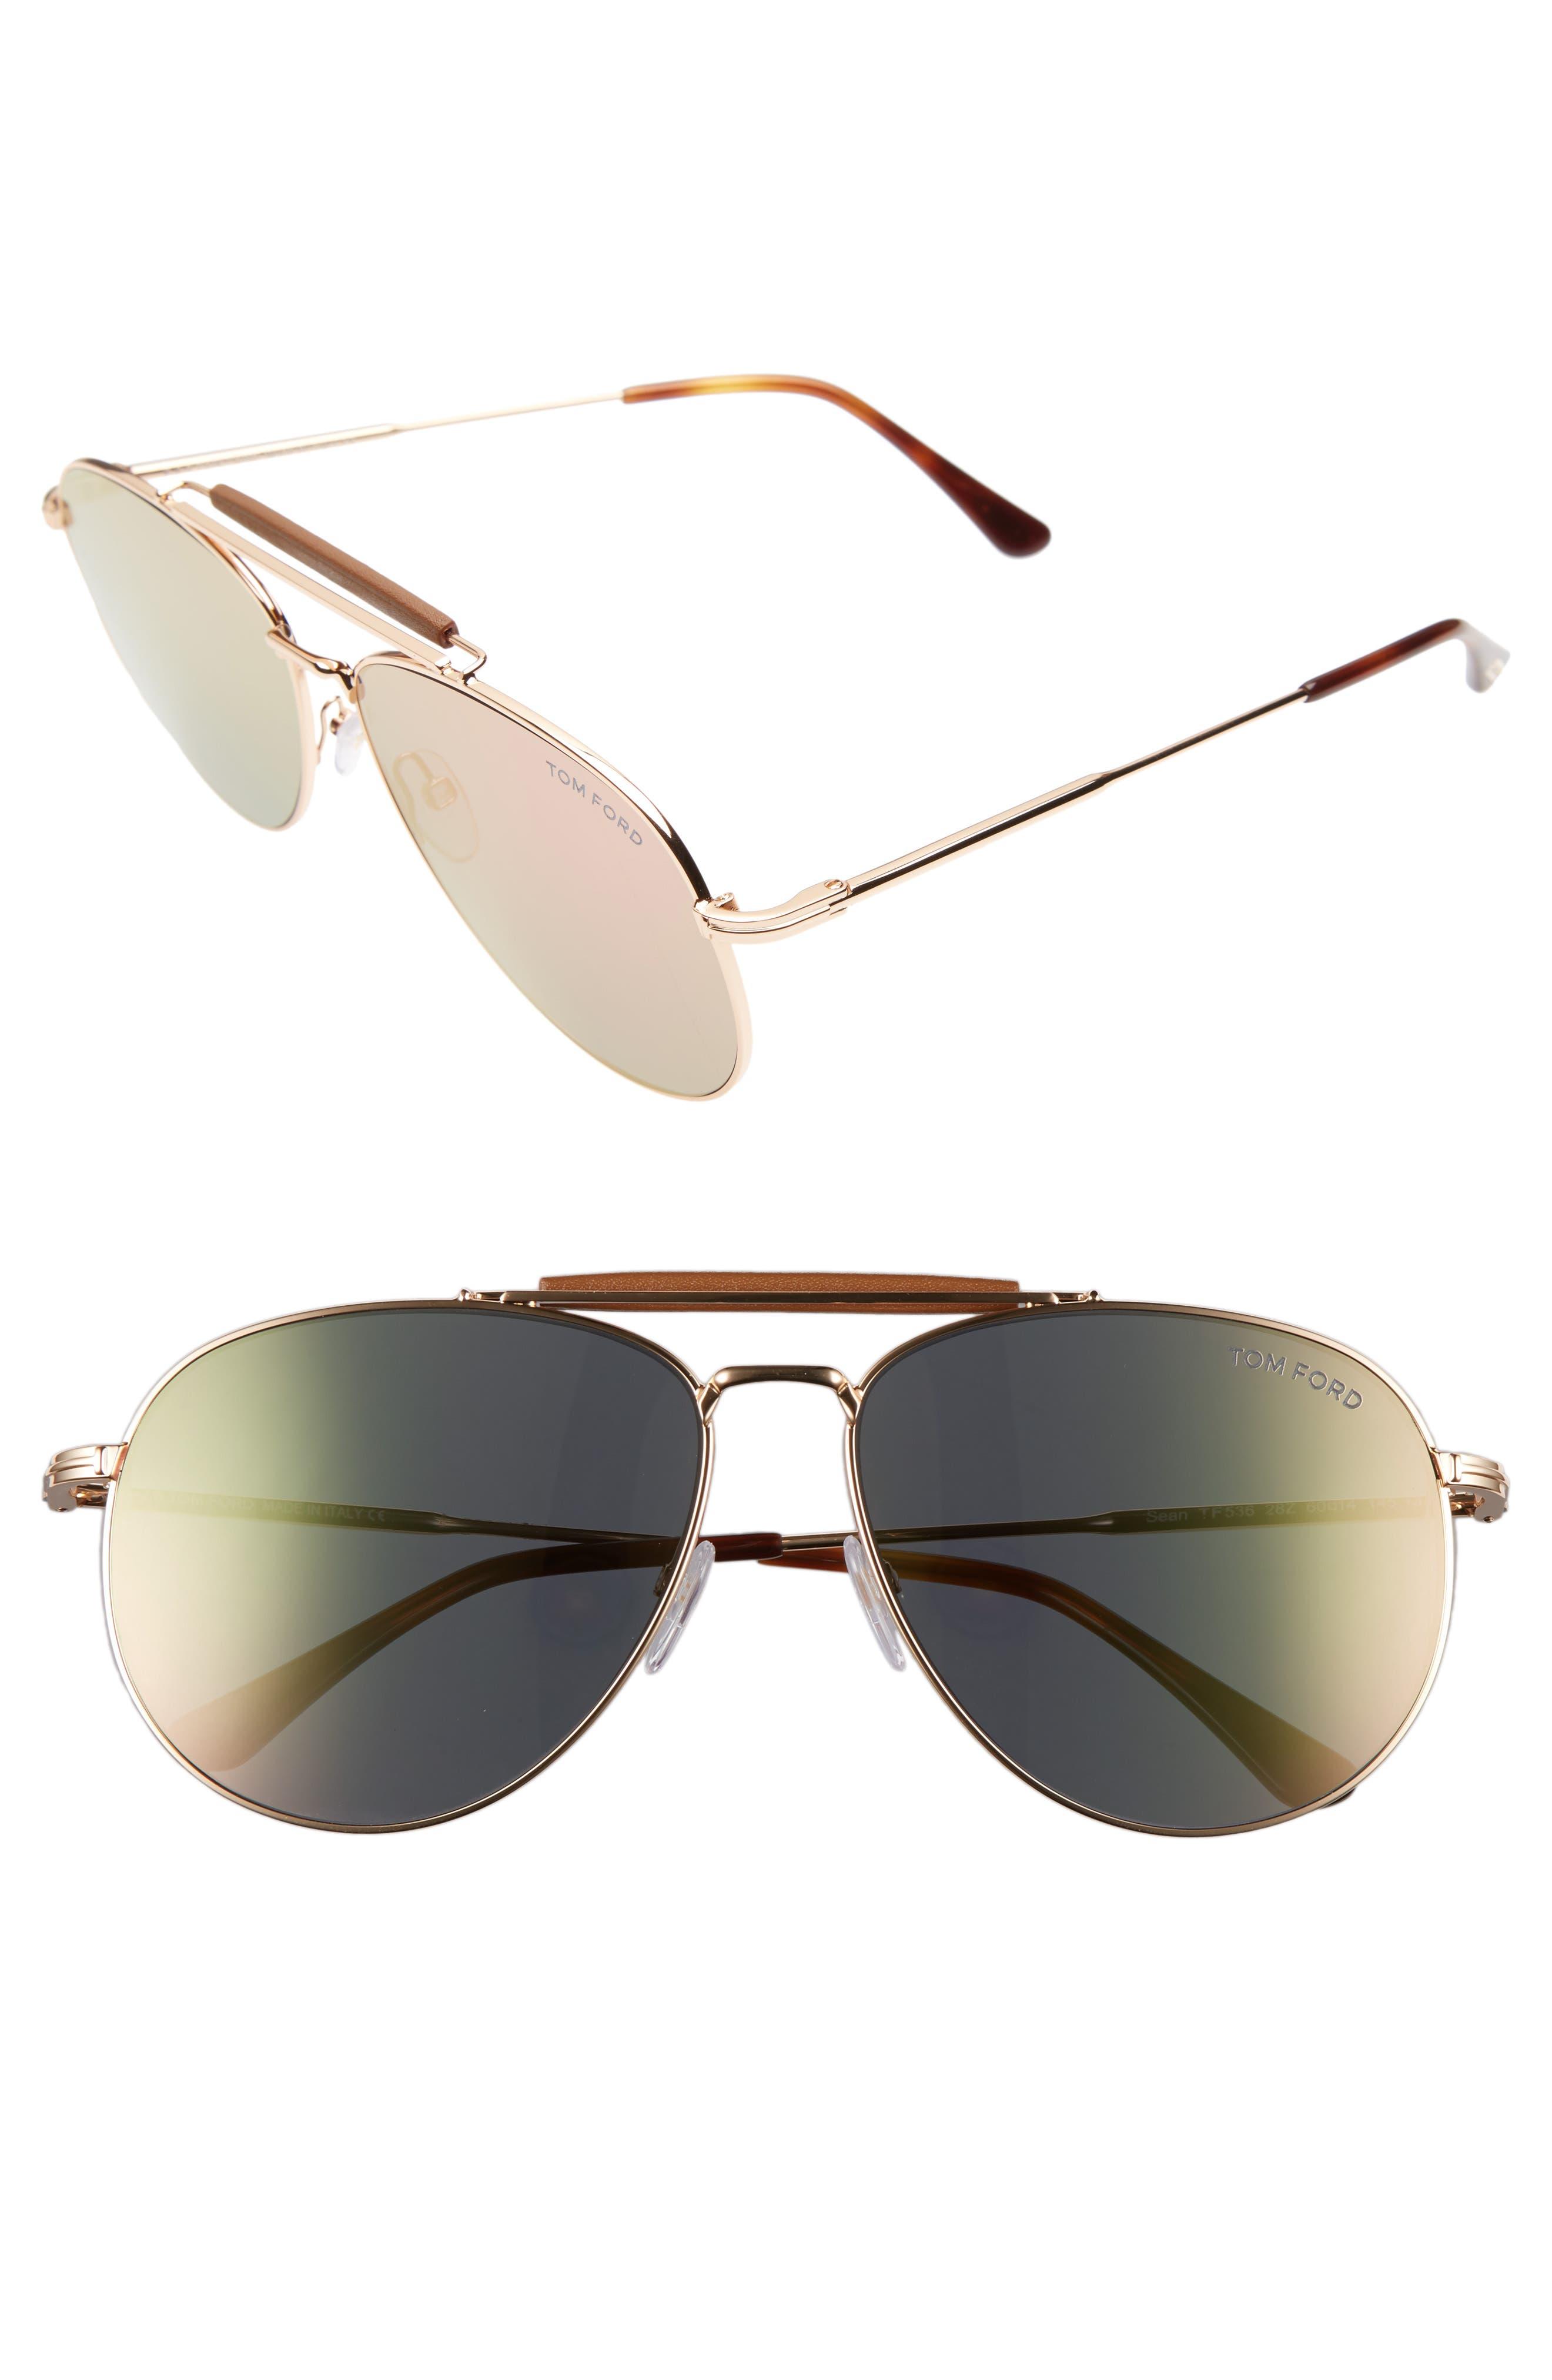 Sean 60mm Aviator Sunglasses,                         Main,                         color, ROSE GOLD/ BROWN/ PINK MIRROR